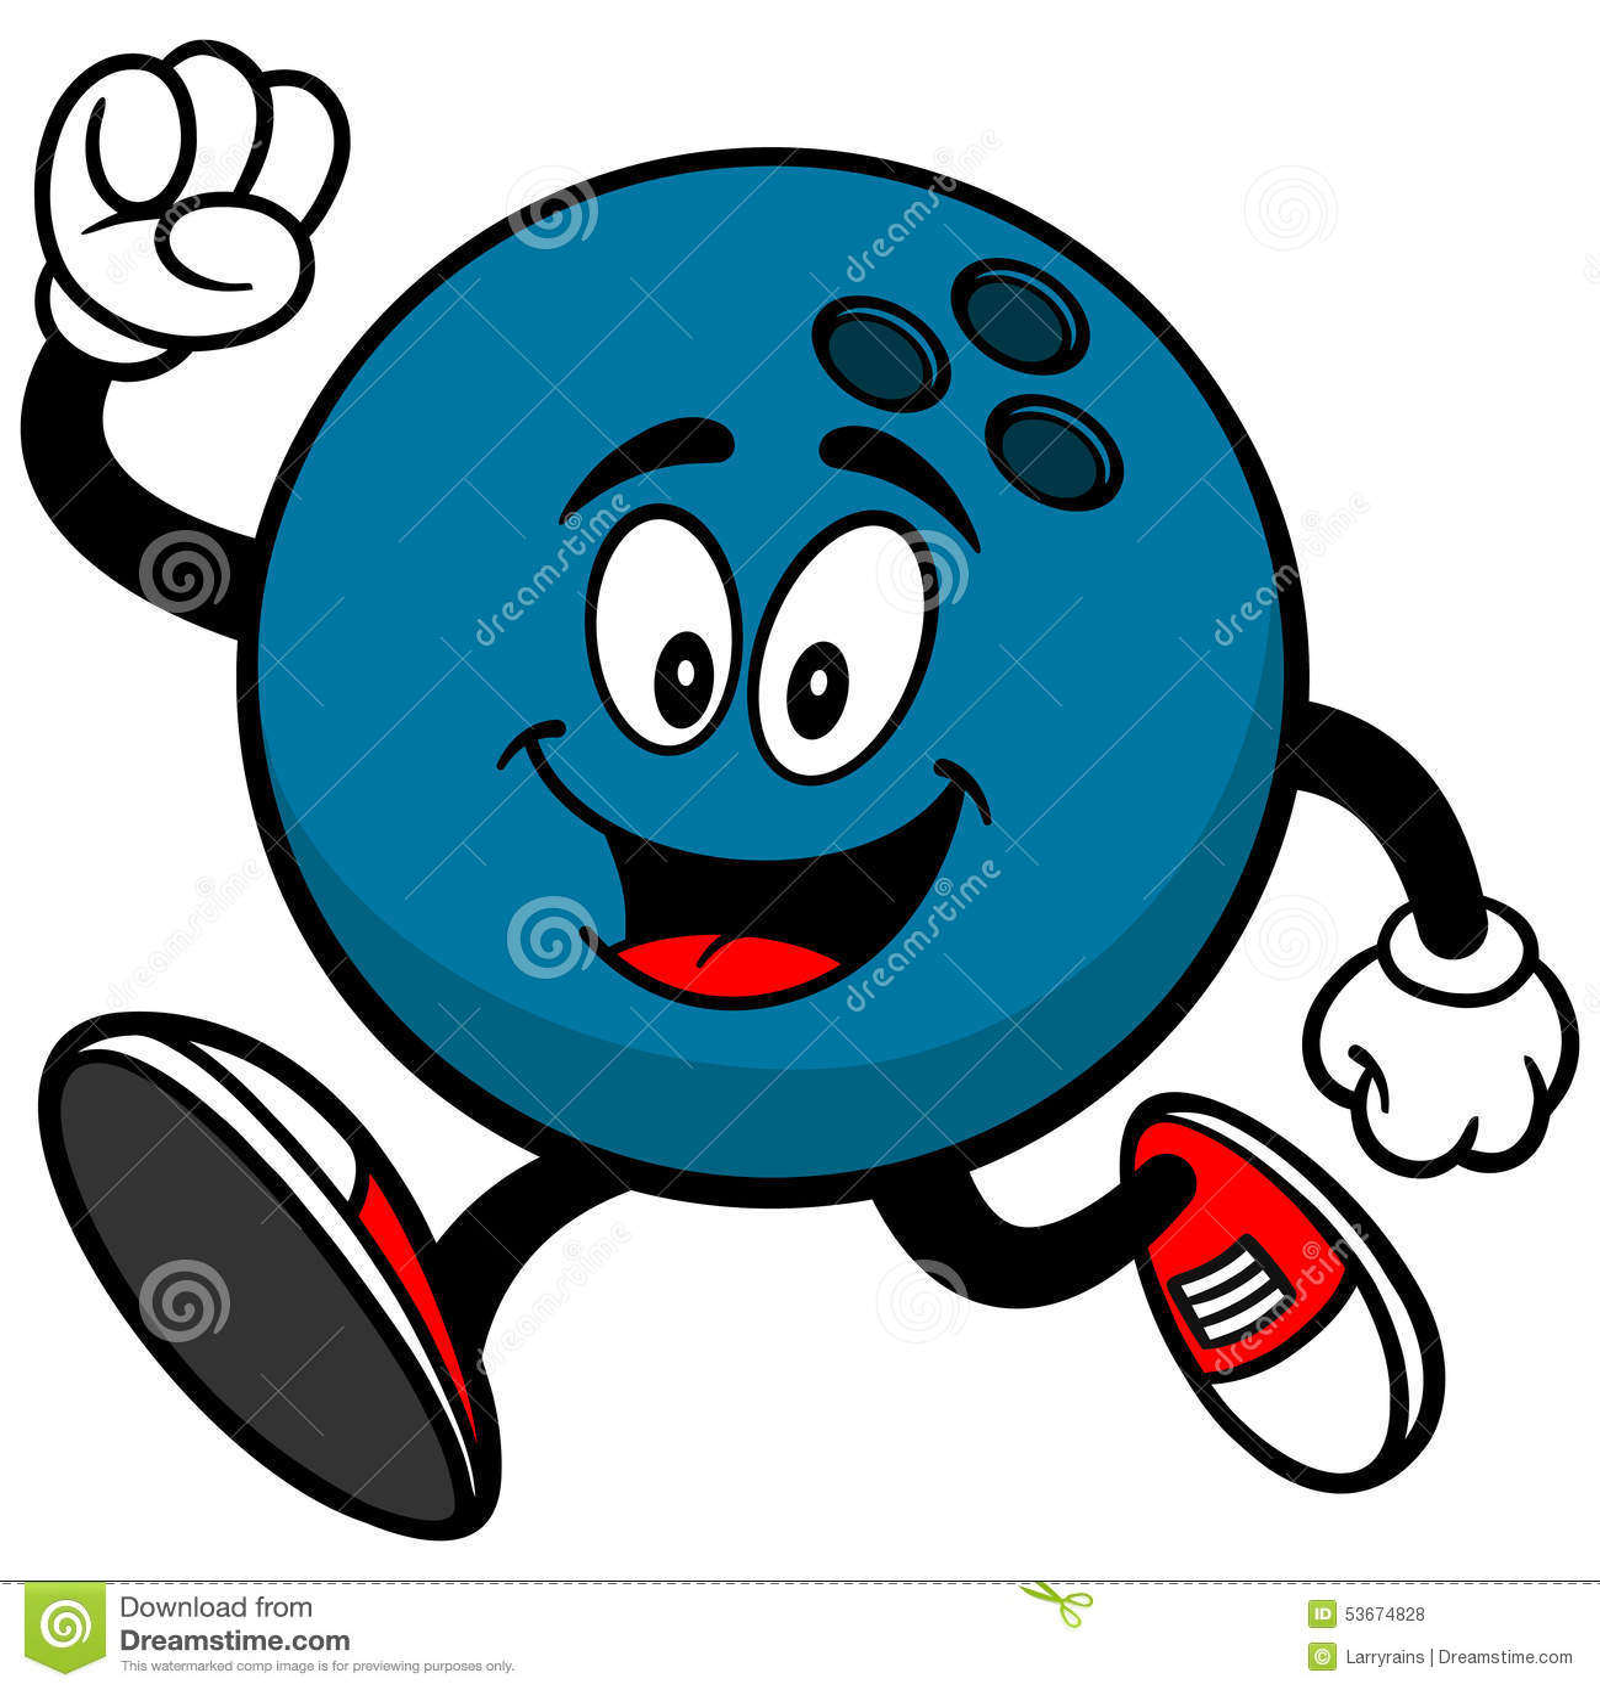 Bowling Ball Running Stock Vector - Image: 53674828